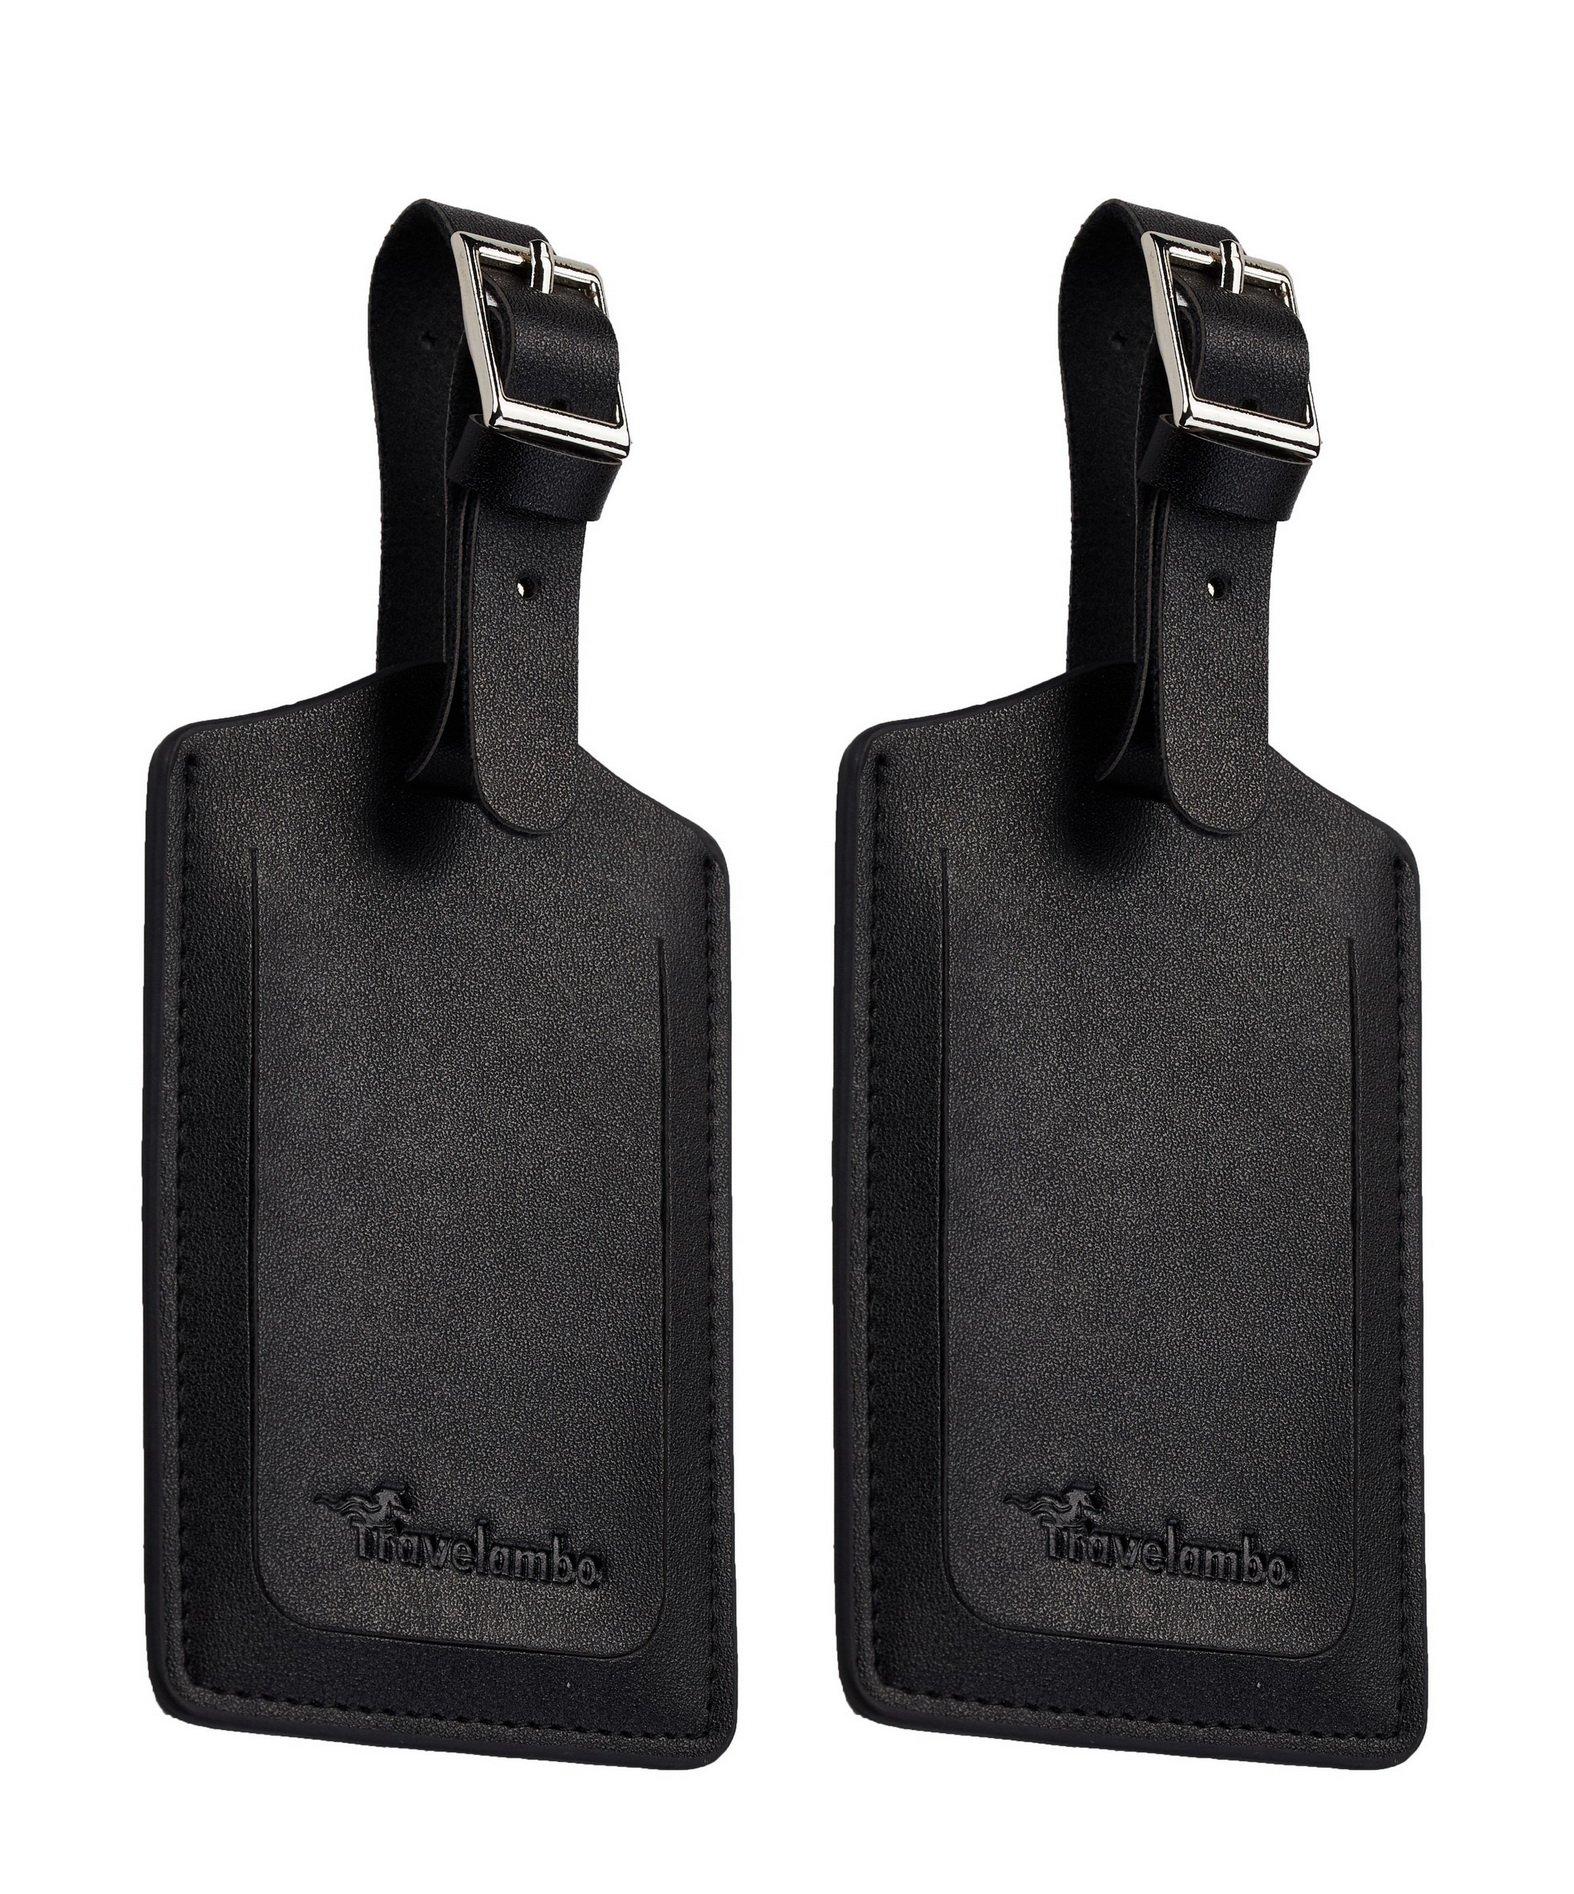 Travelambo Leather Luggage Bag Tags (Black 4001- Classic Black) by Travelambo (Image #3)